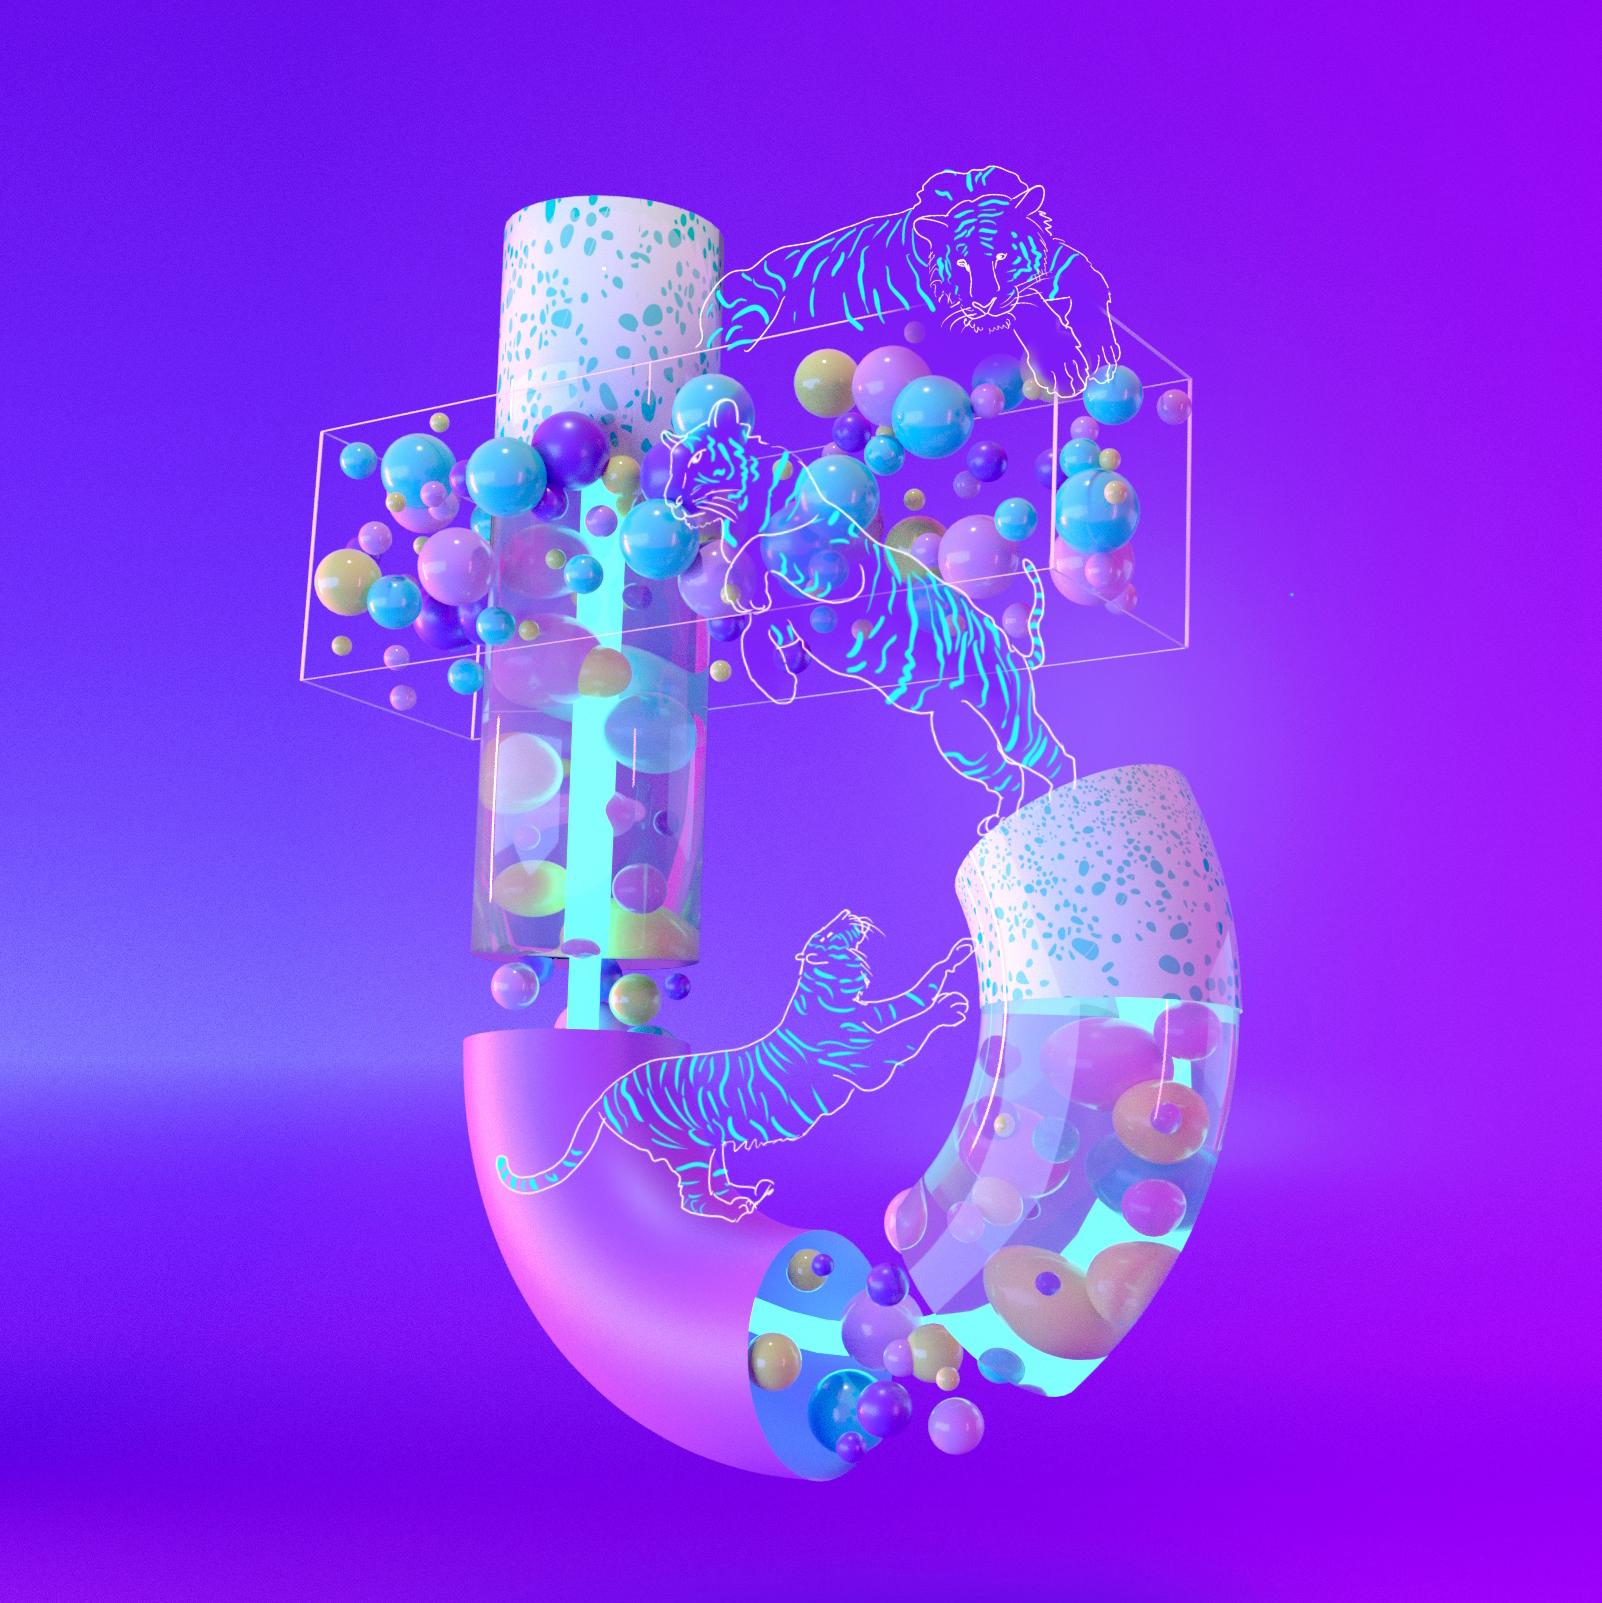 chris-winterton-T-typography-3D-36daysoftype.jpg